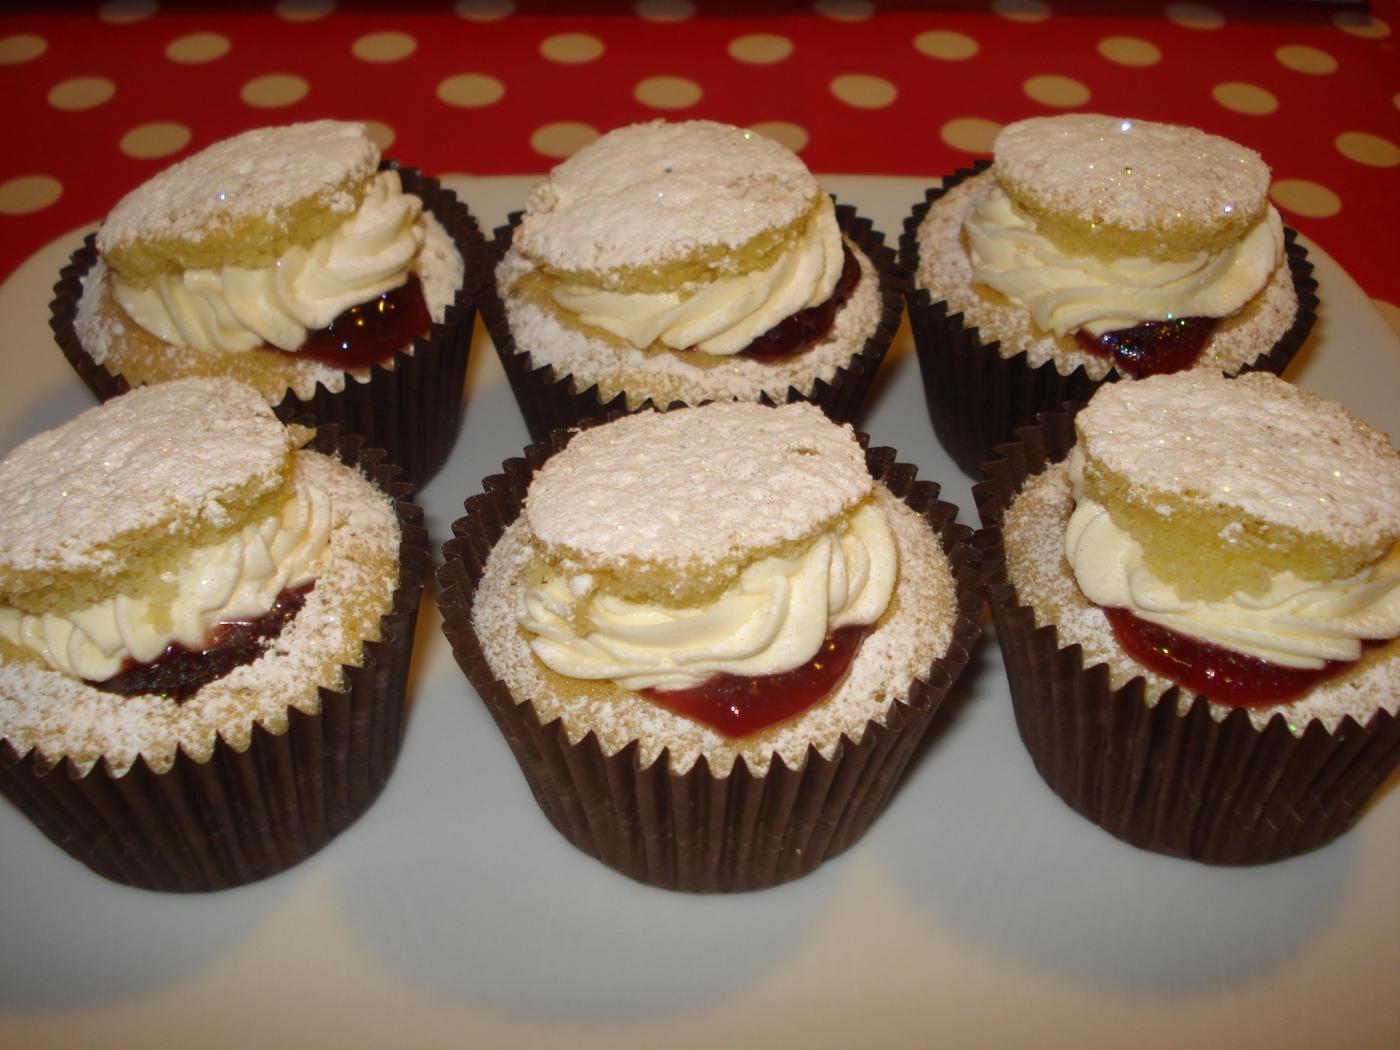 Traditional Victoria Sponge Cupcakes